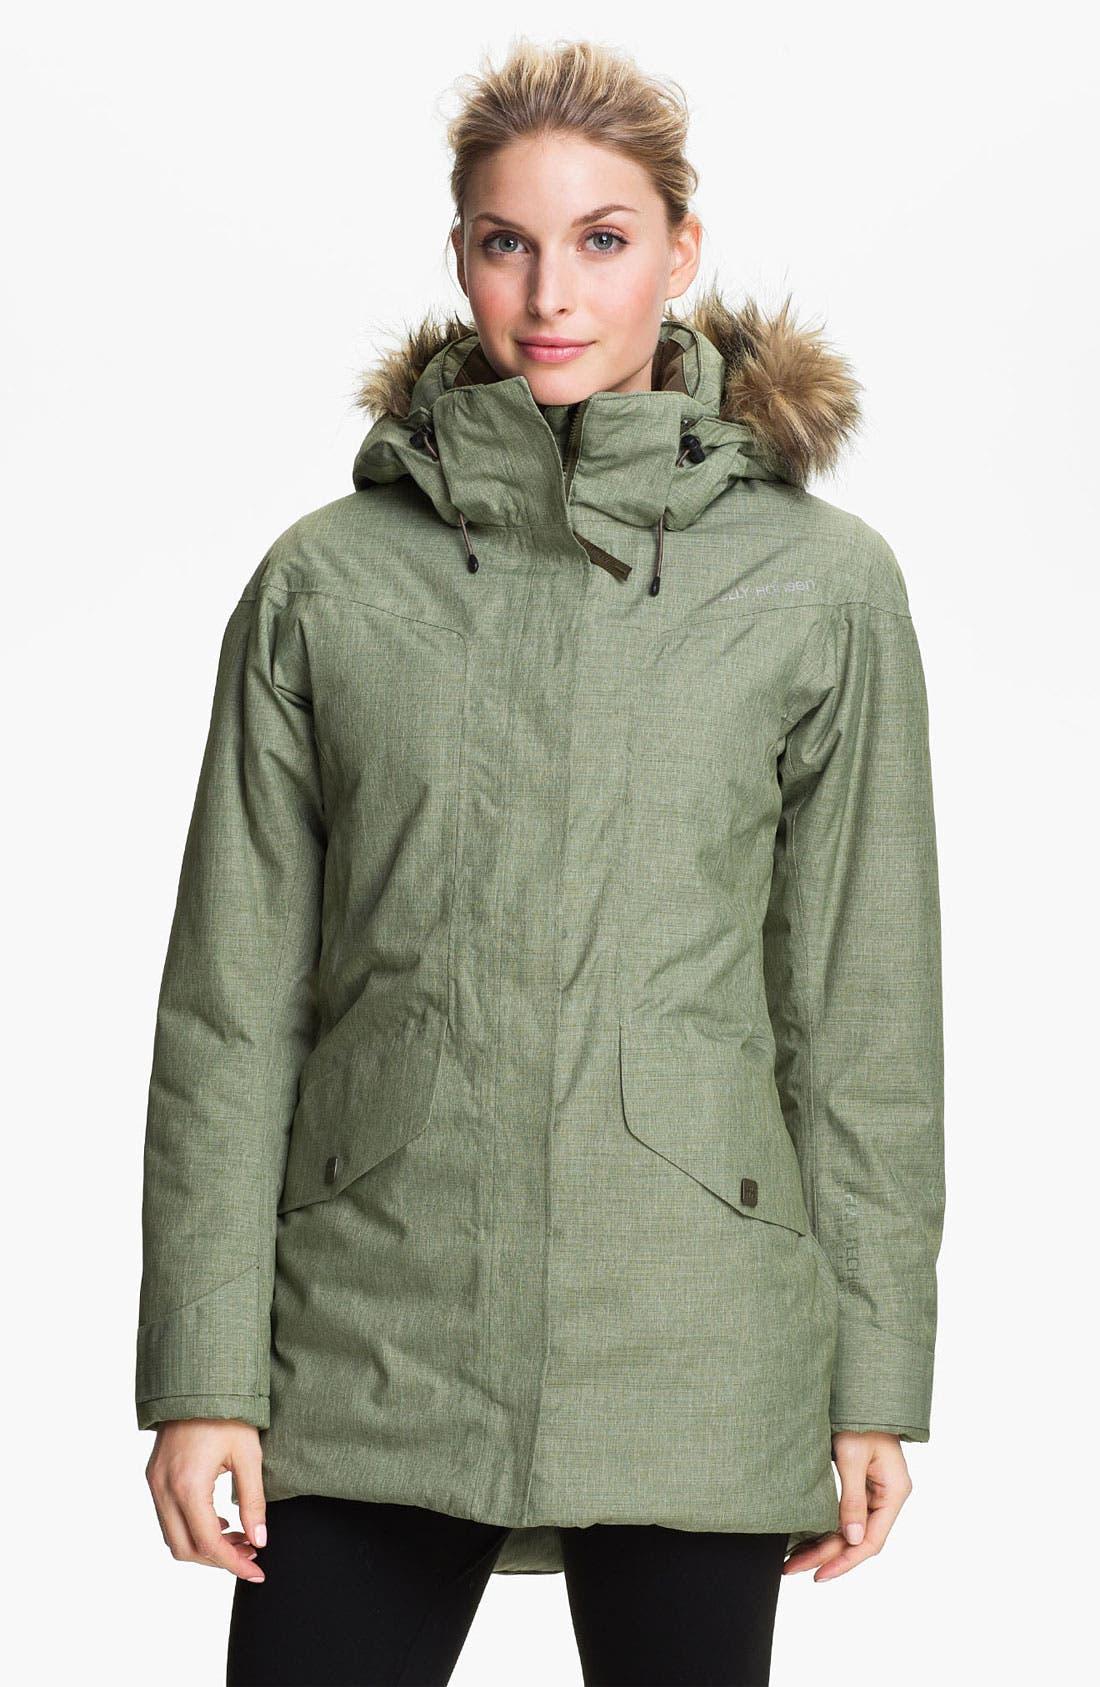 Alternate Image 1 Selected - Helly Hansen 'Hilton 2' Jacket